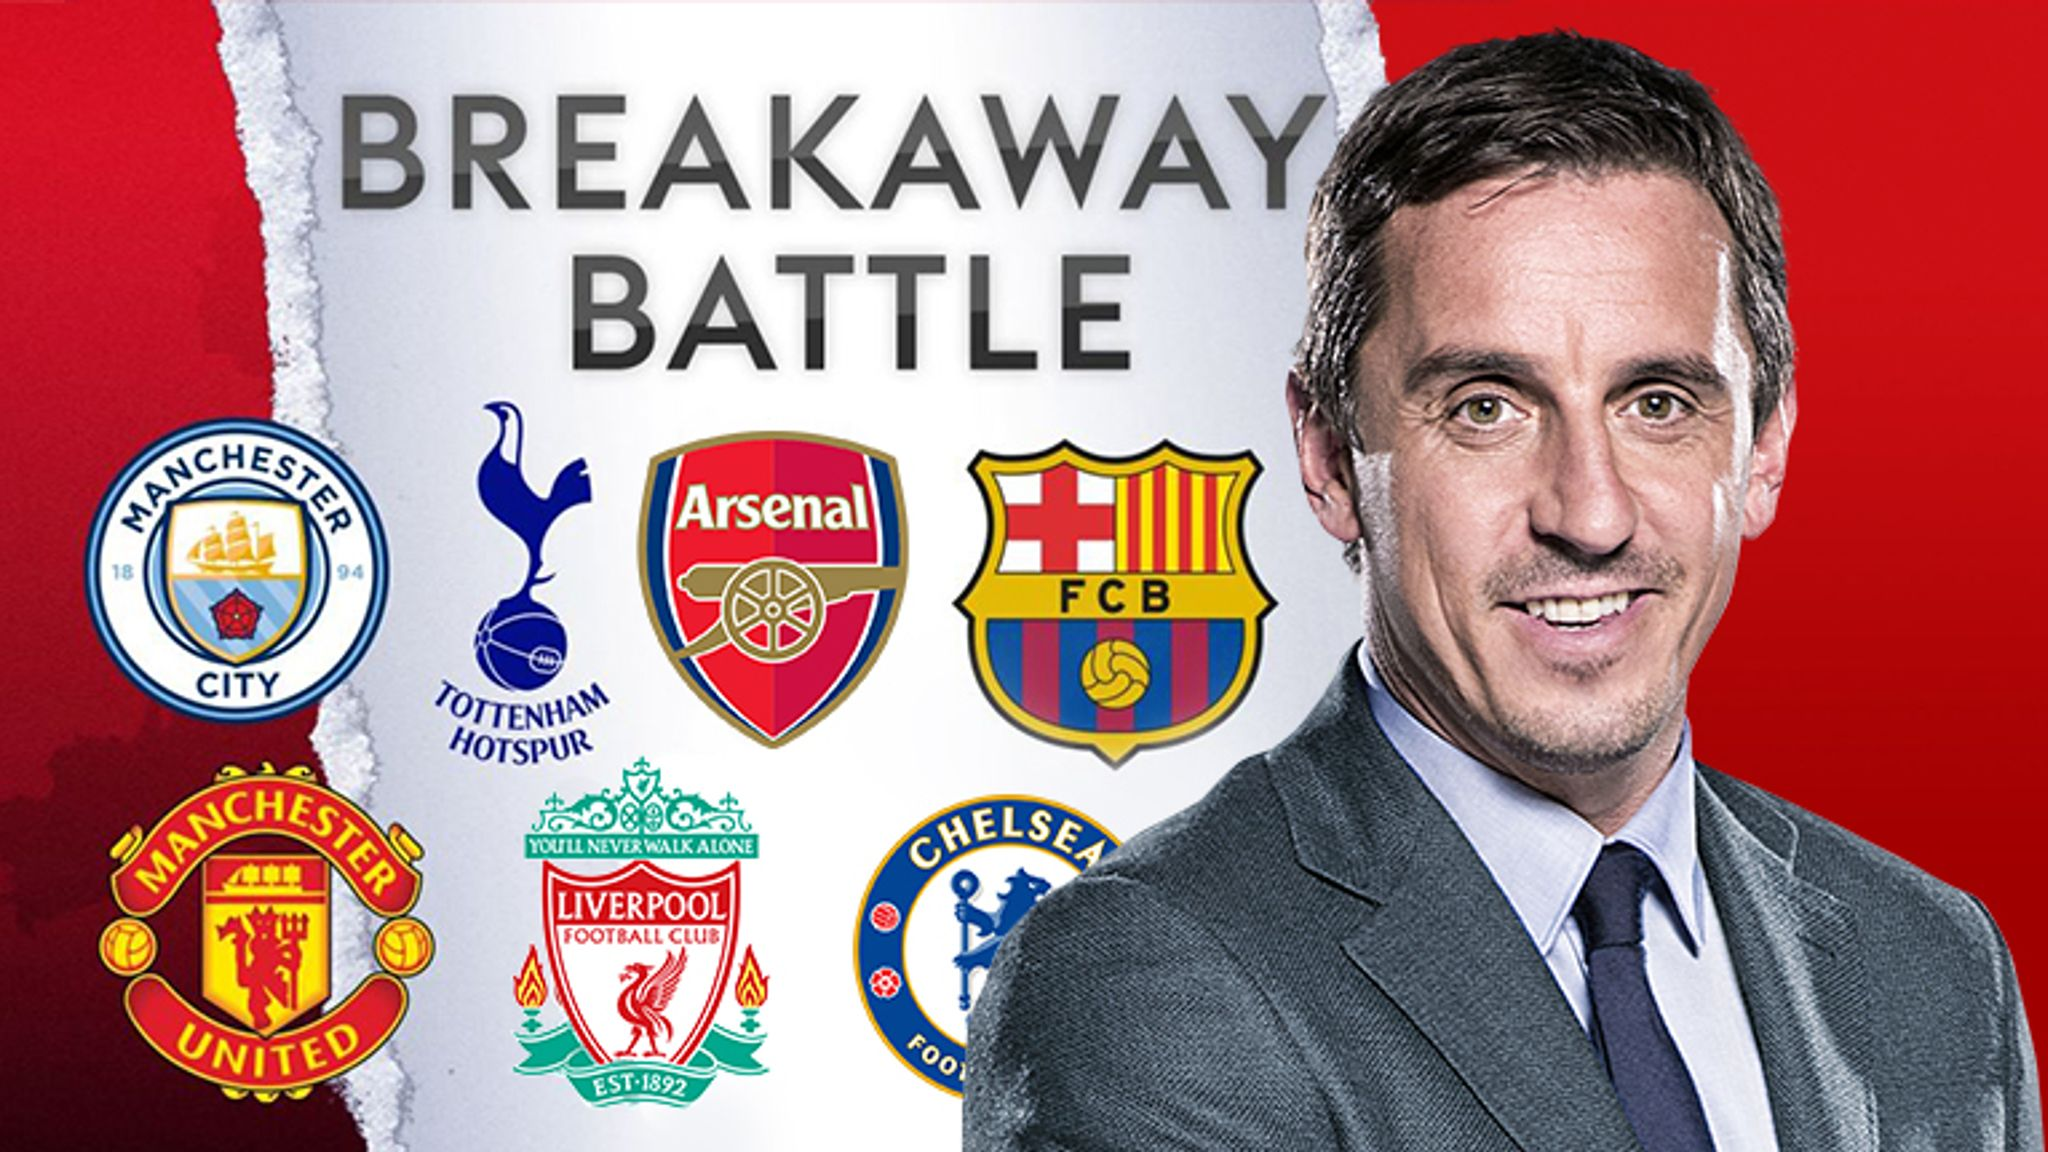 Gary Neville on European Super League plans: 'I'm fuming... but it wont go  through, not a chance' | Football News | Sky Sports